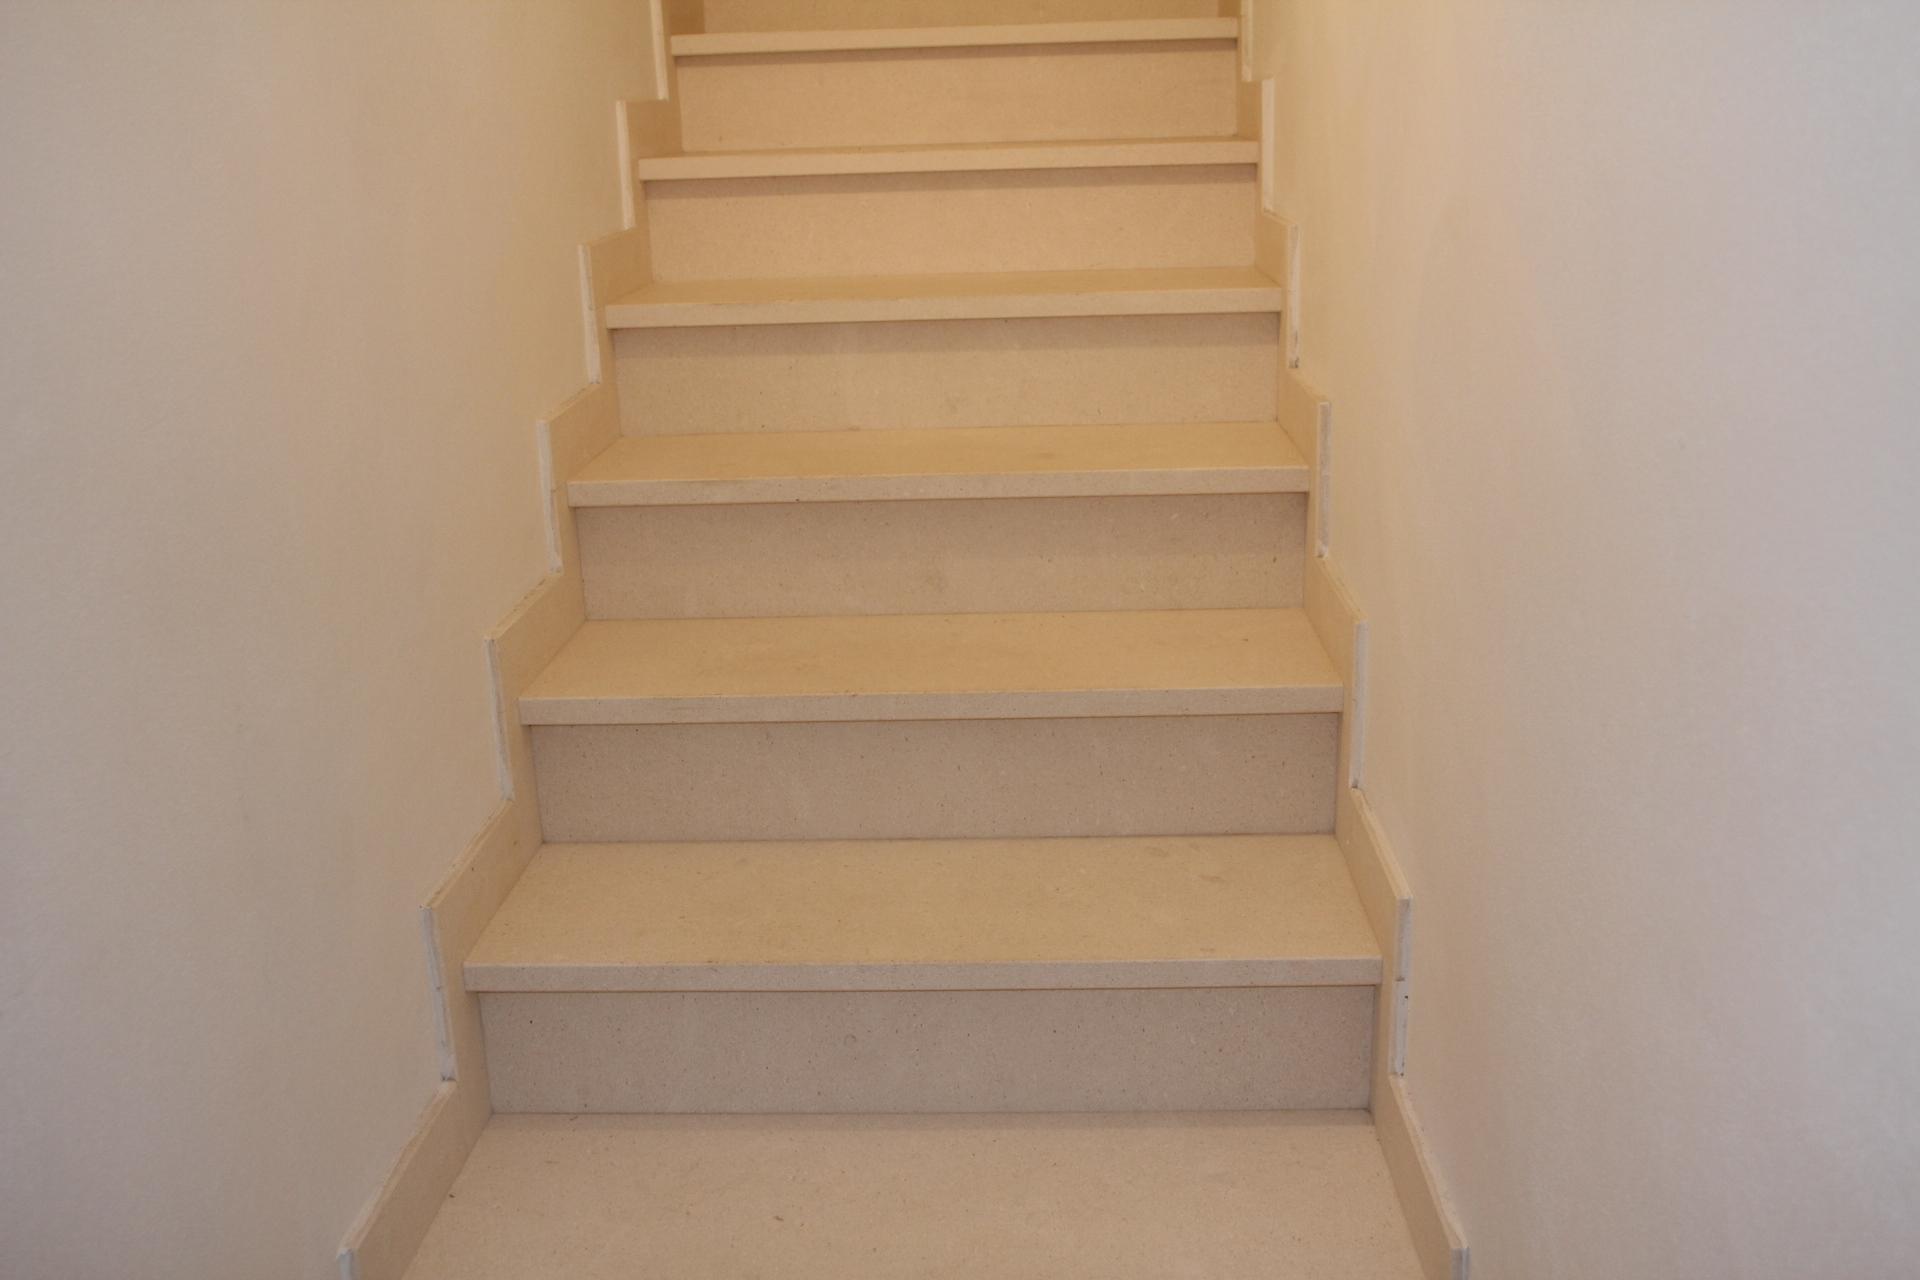 Immagini di bellissime scale di pietra e marmo zem marmi a - Immagini di scale ...